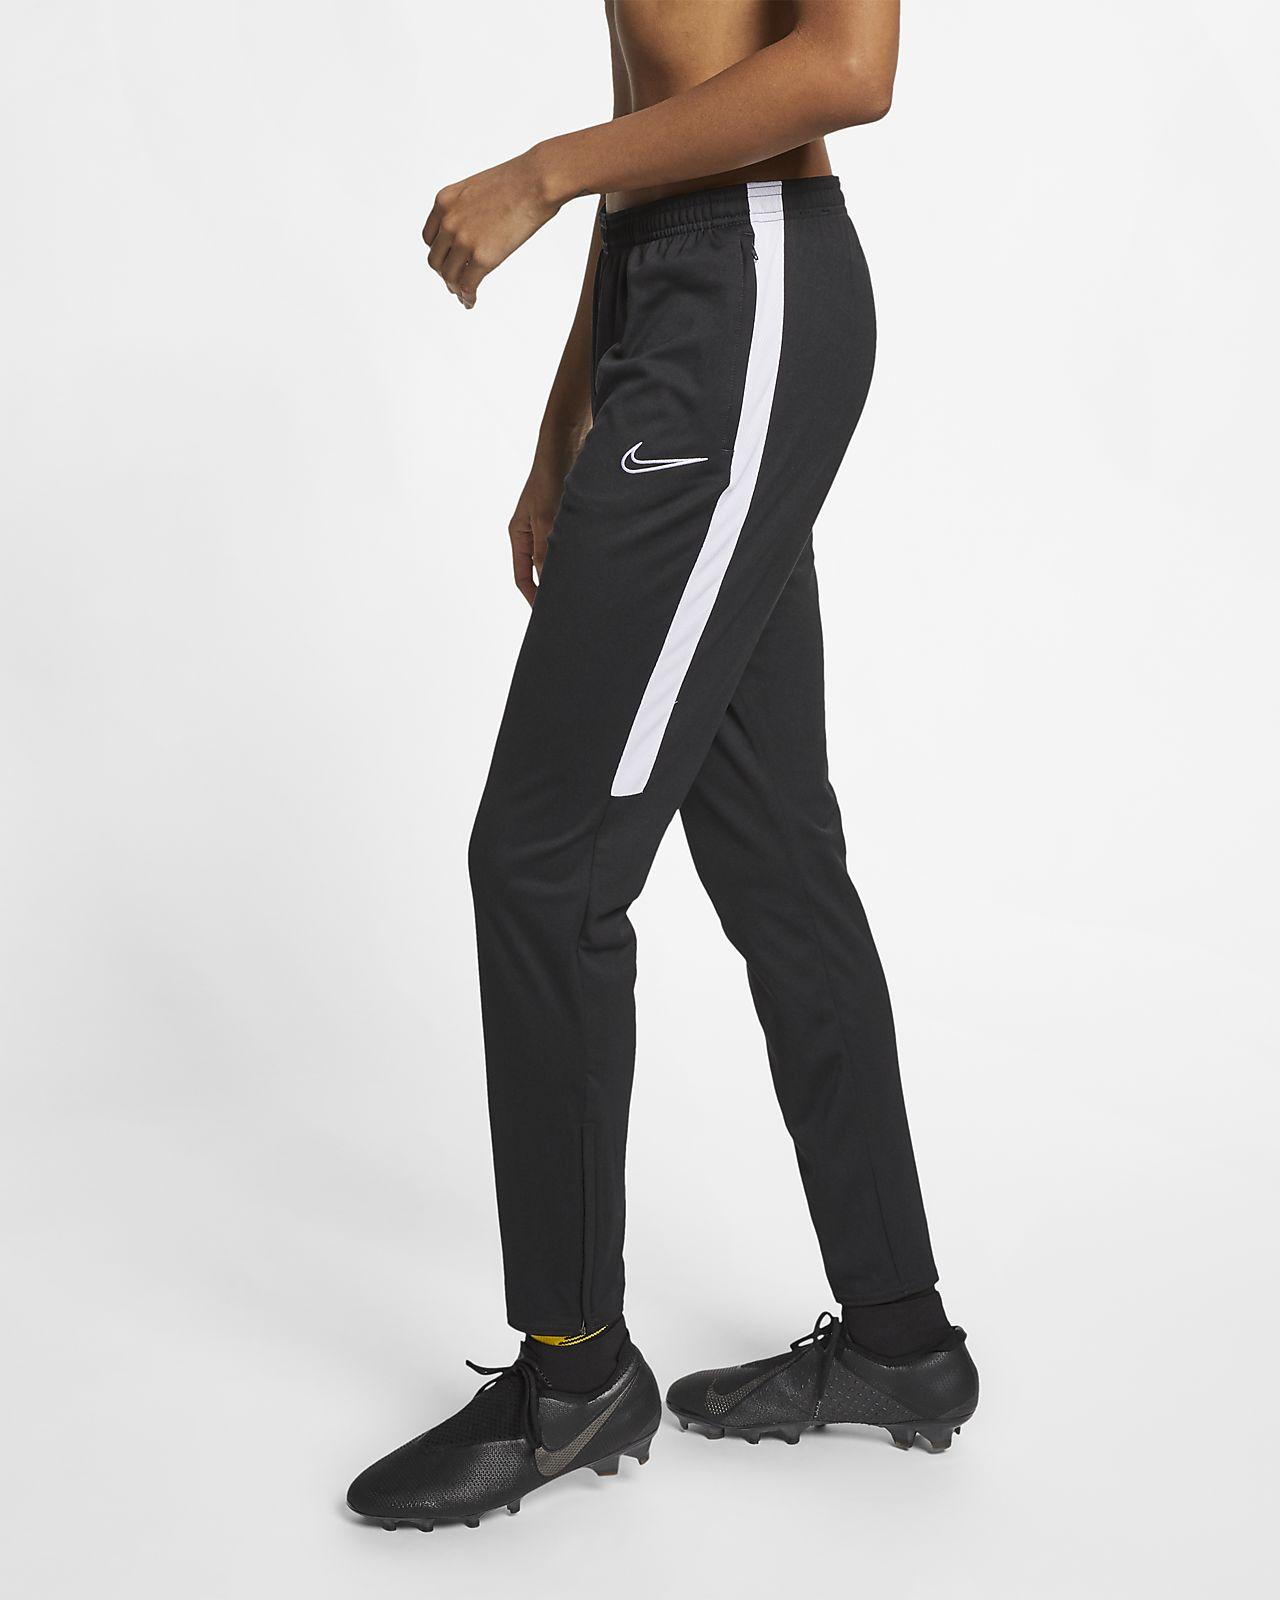 new product 50846 c7022 ... Nike Dri-FIT Academy Women s Football Pants